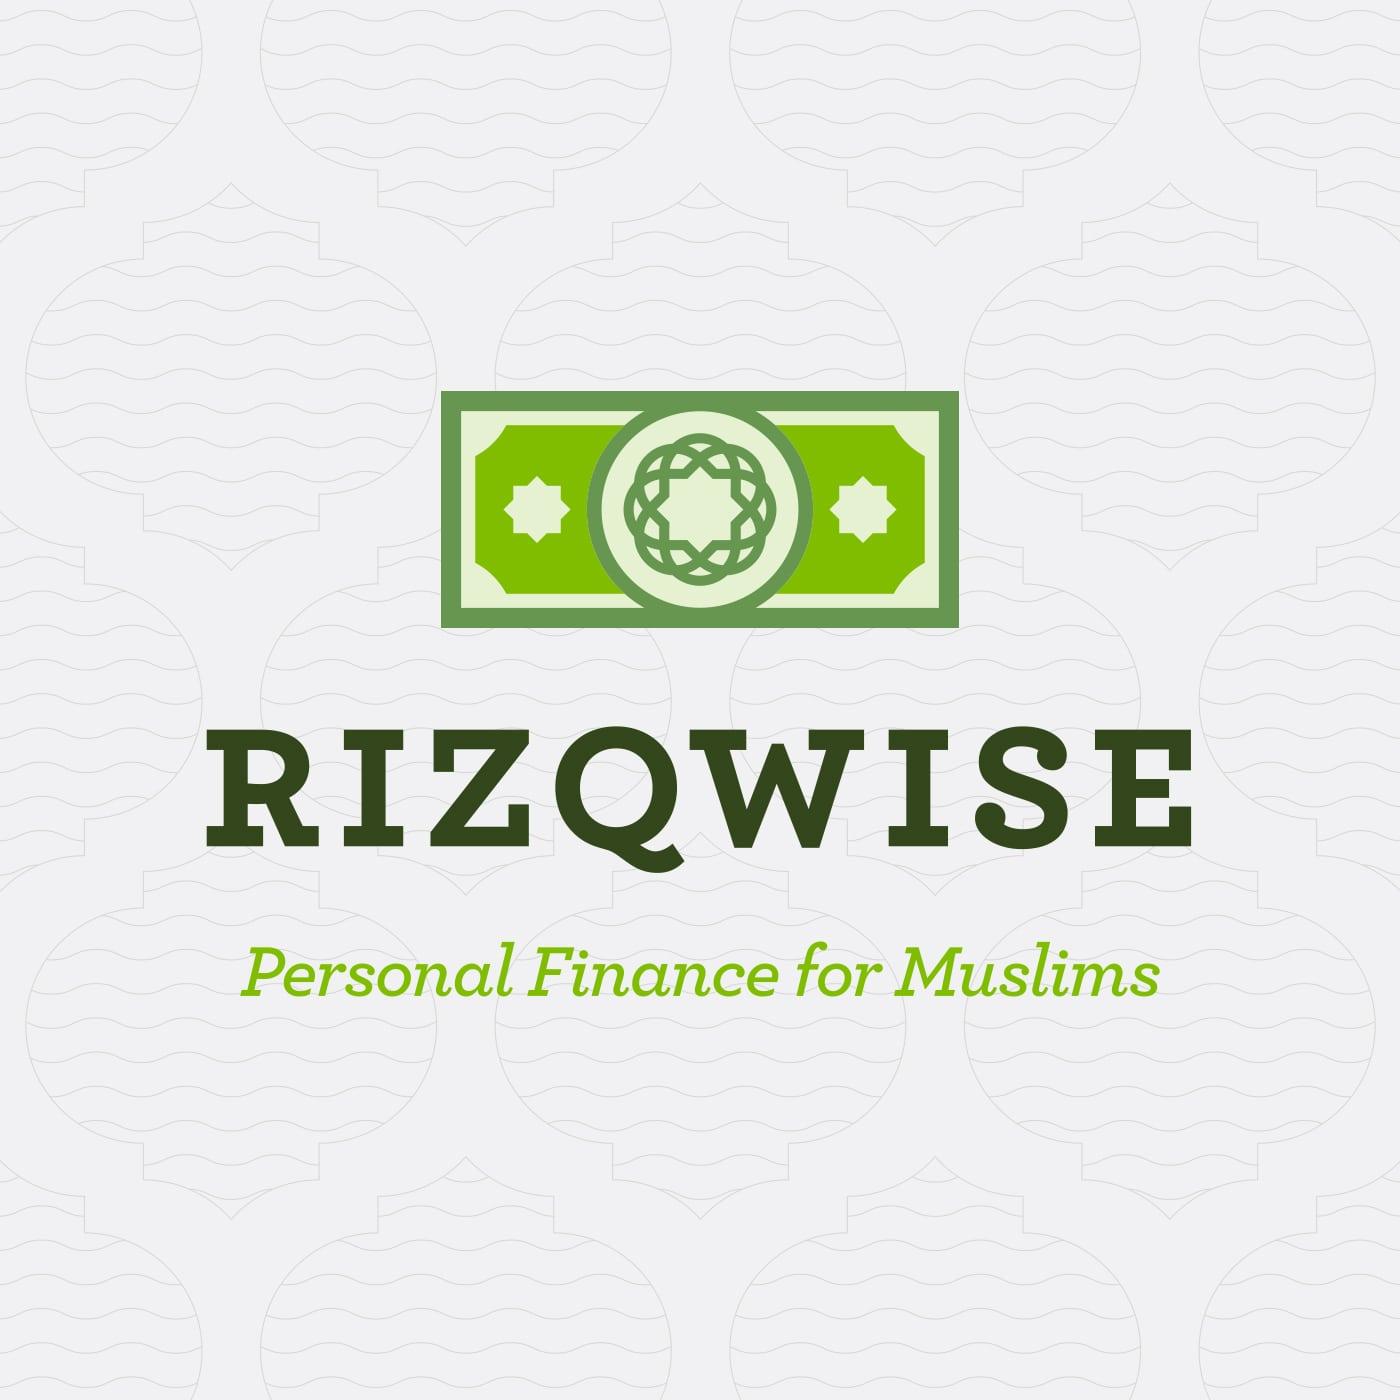 Rizqwise